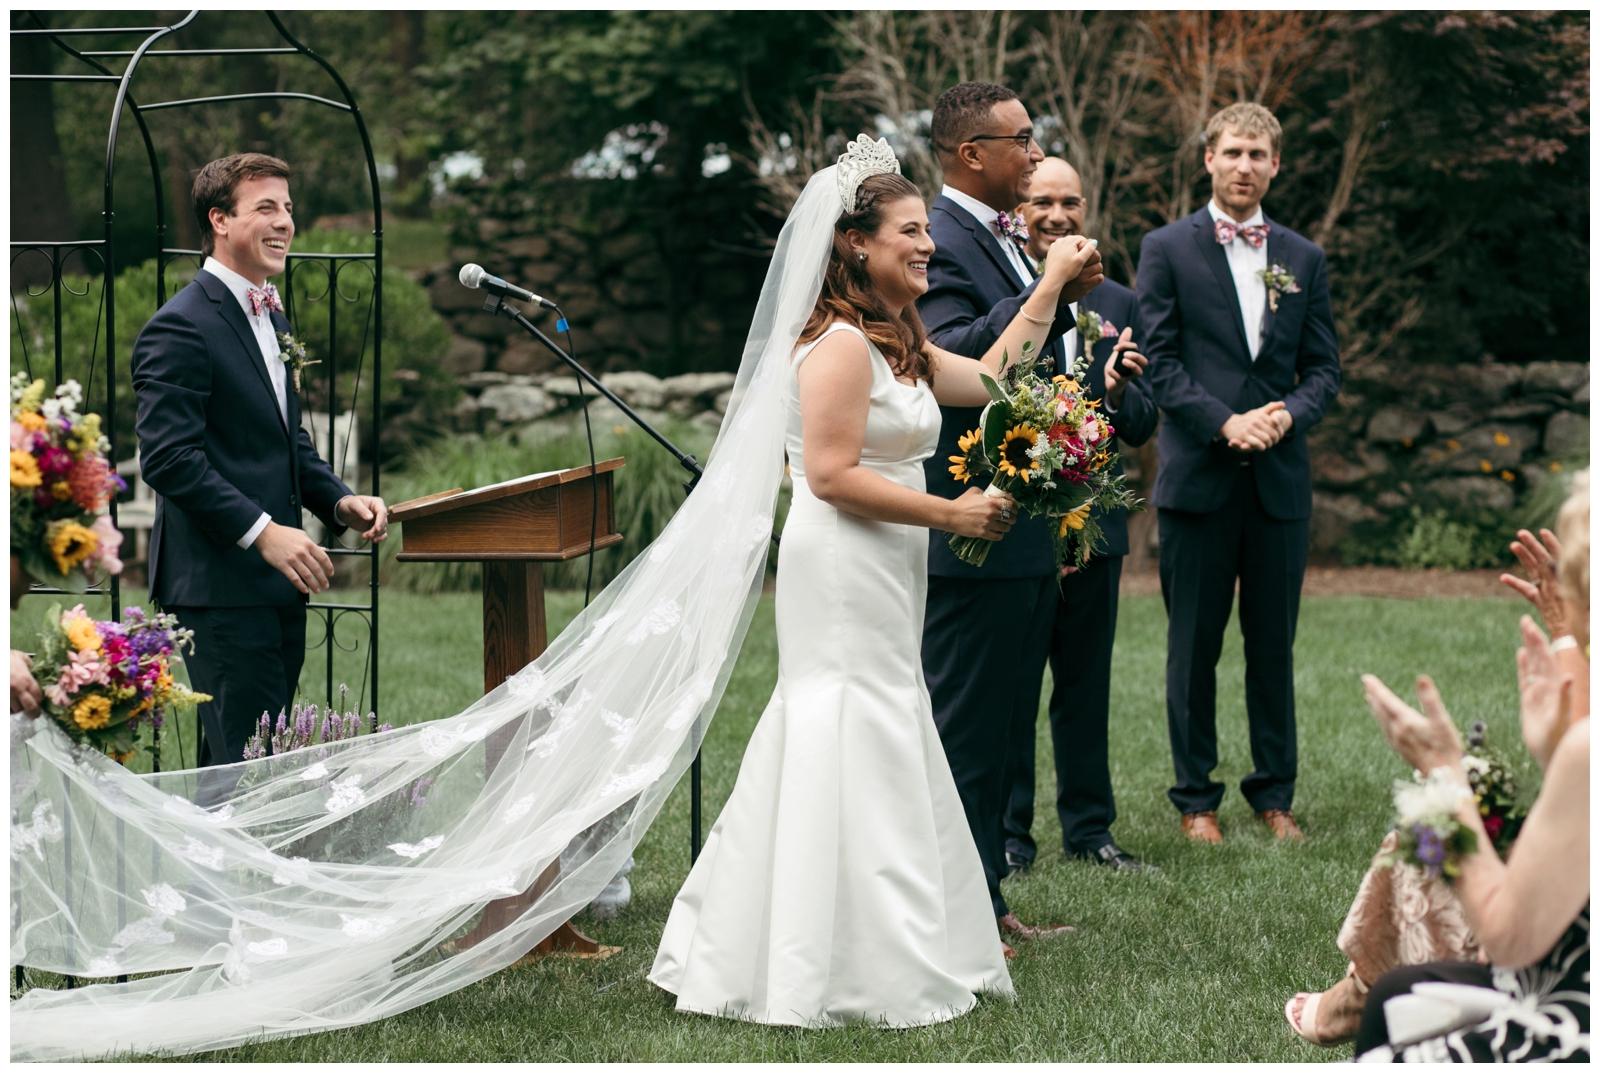 Bailey-Q-Photo-Connors-Center-Wedding-Boston-Wedding-Photographer-061.jpg